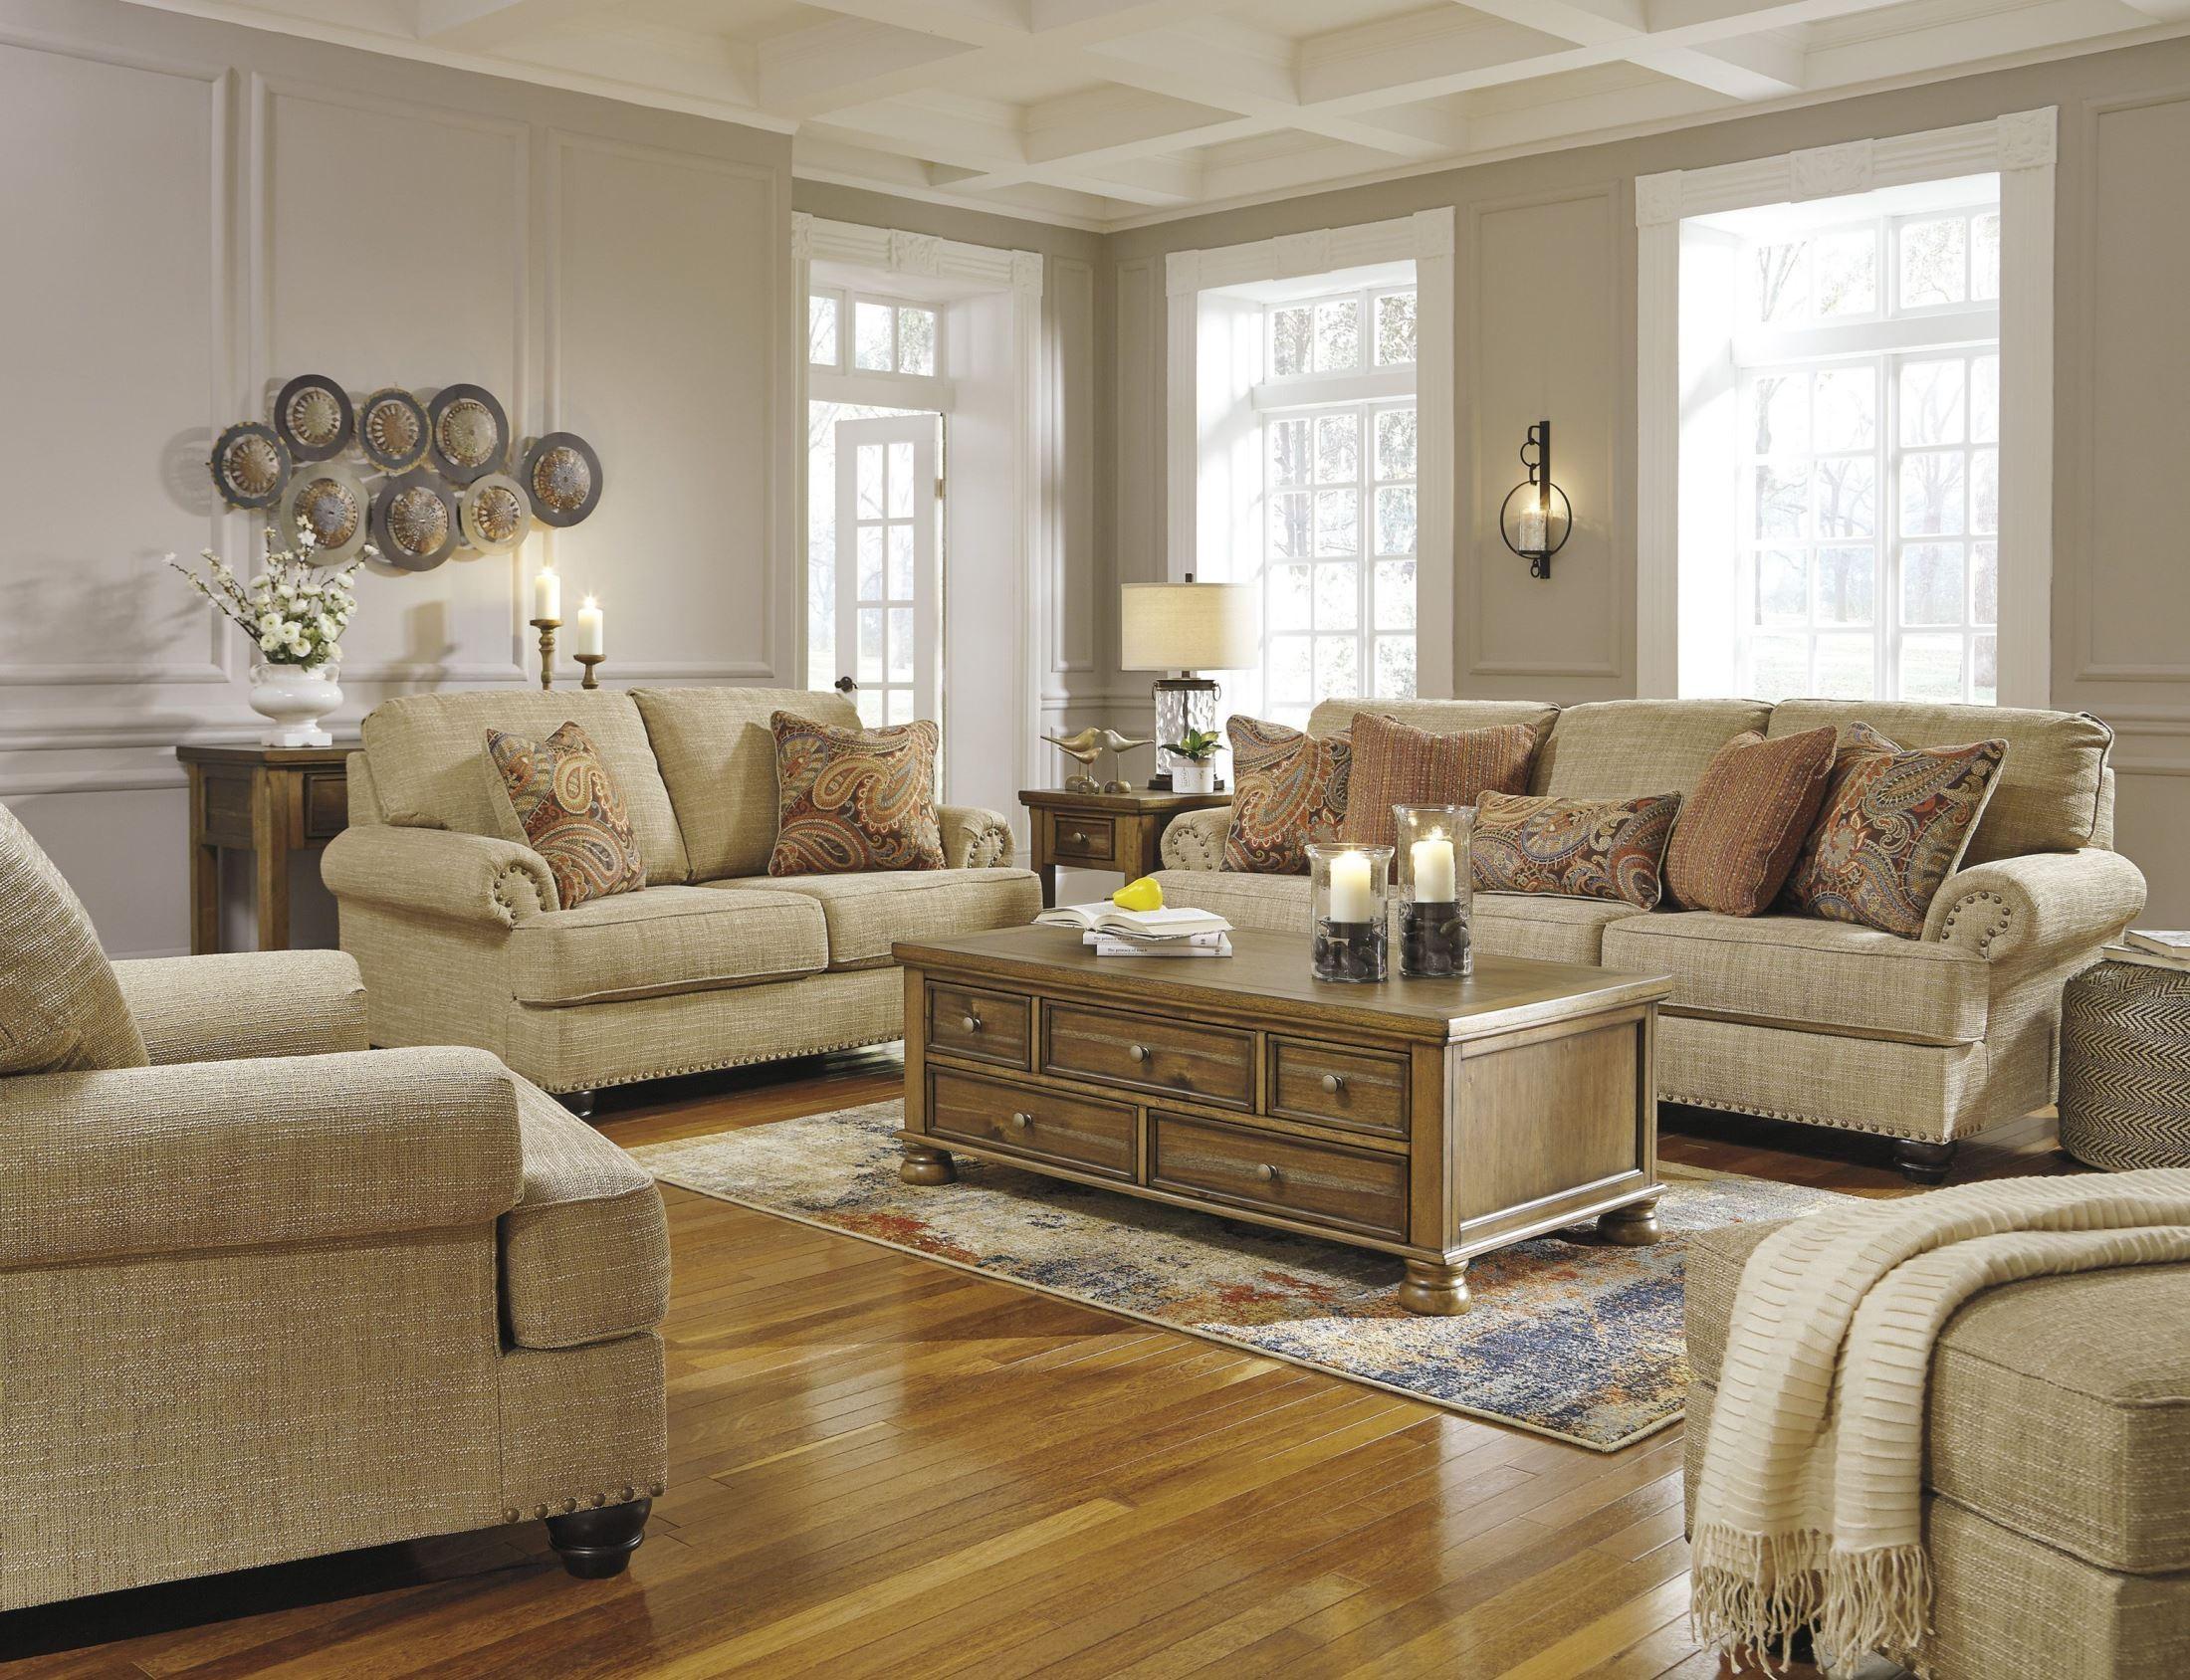 oatmeal sofa set sofascore barcelona vs atletico madrid candoro living room from ashley coleman